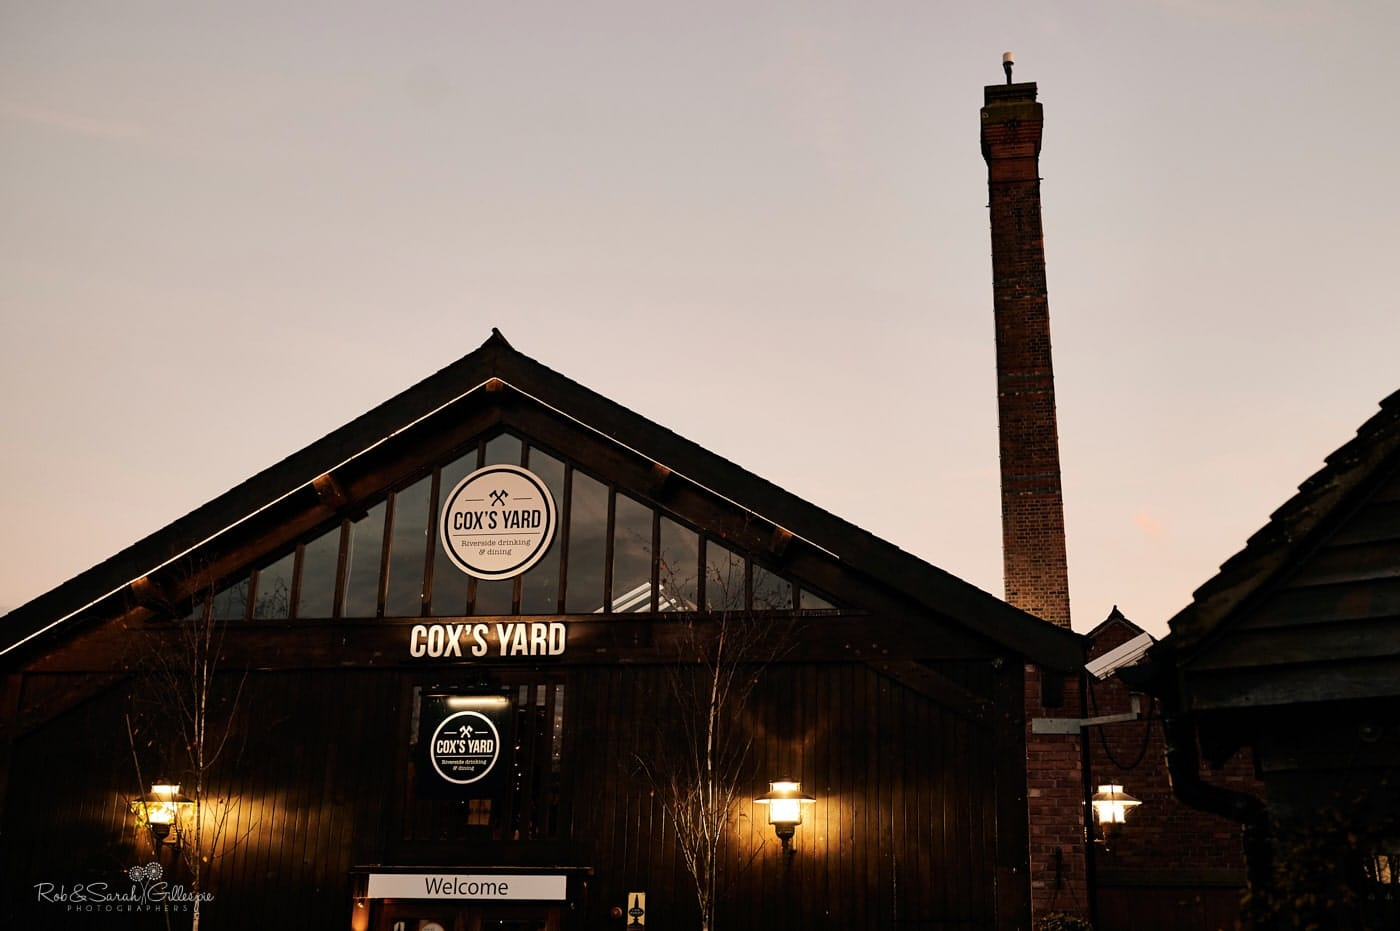 Cox's Yard in Stratford-upon-Avon